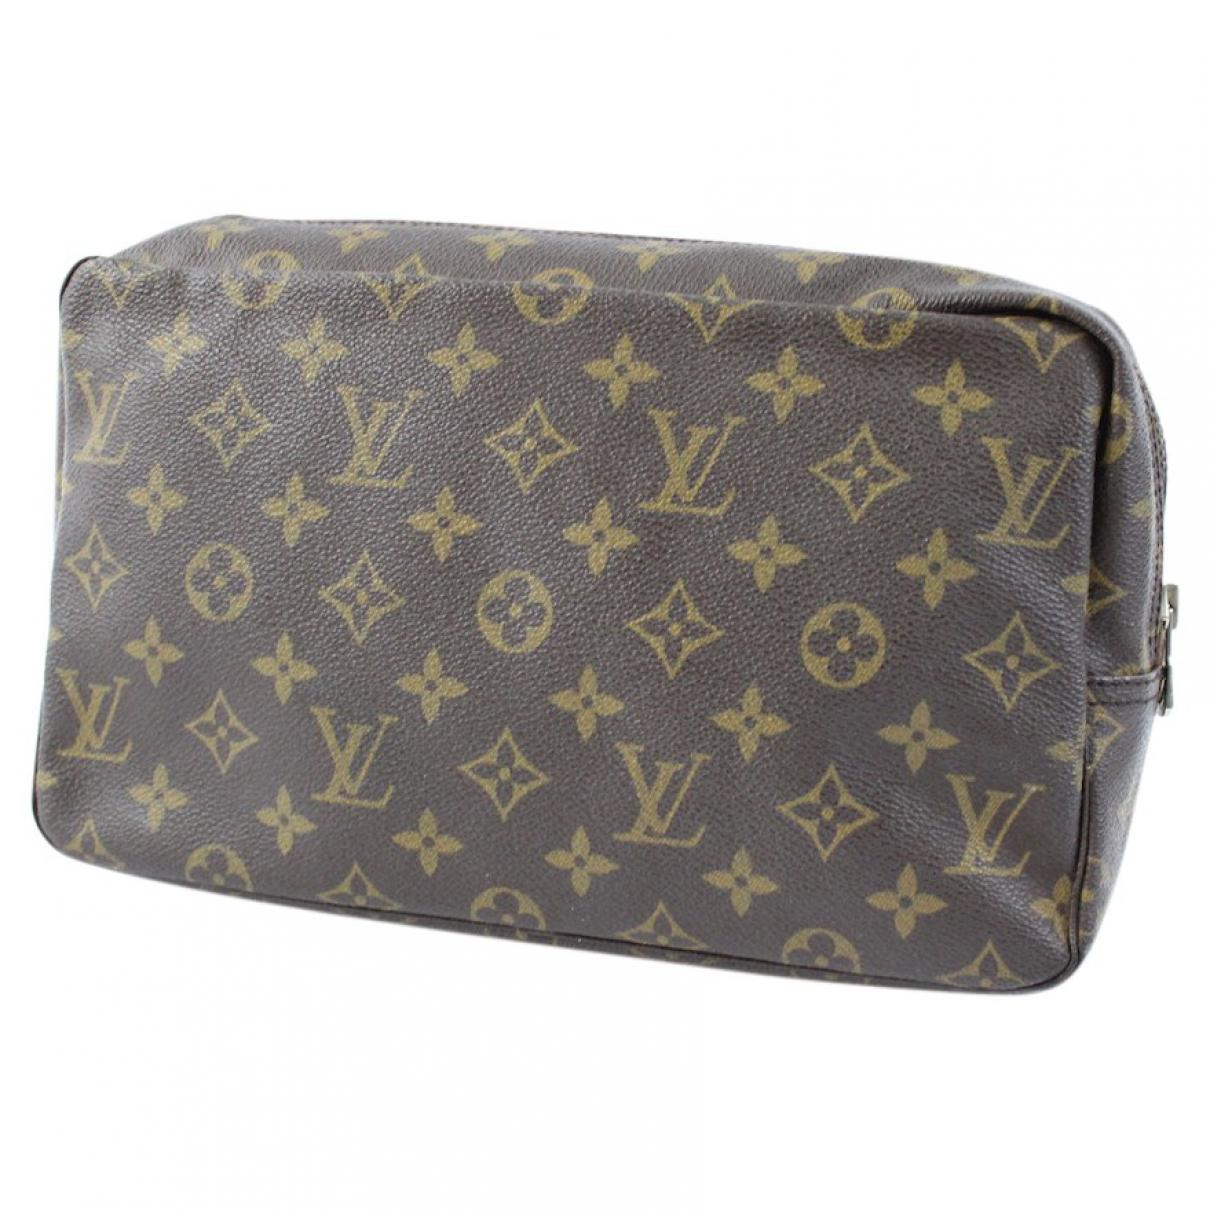 3e484d7e6e444 Louis Vuitton Pre-owned Cloth Vanity Case in Brown - Lyst